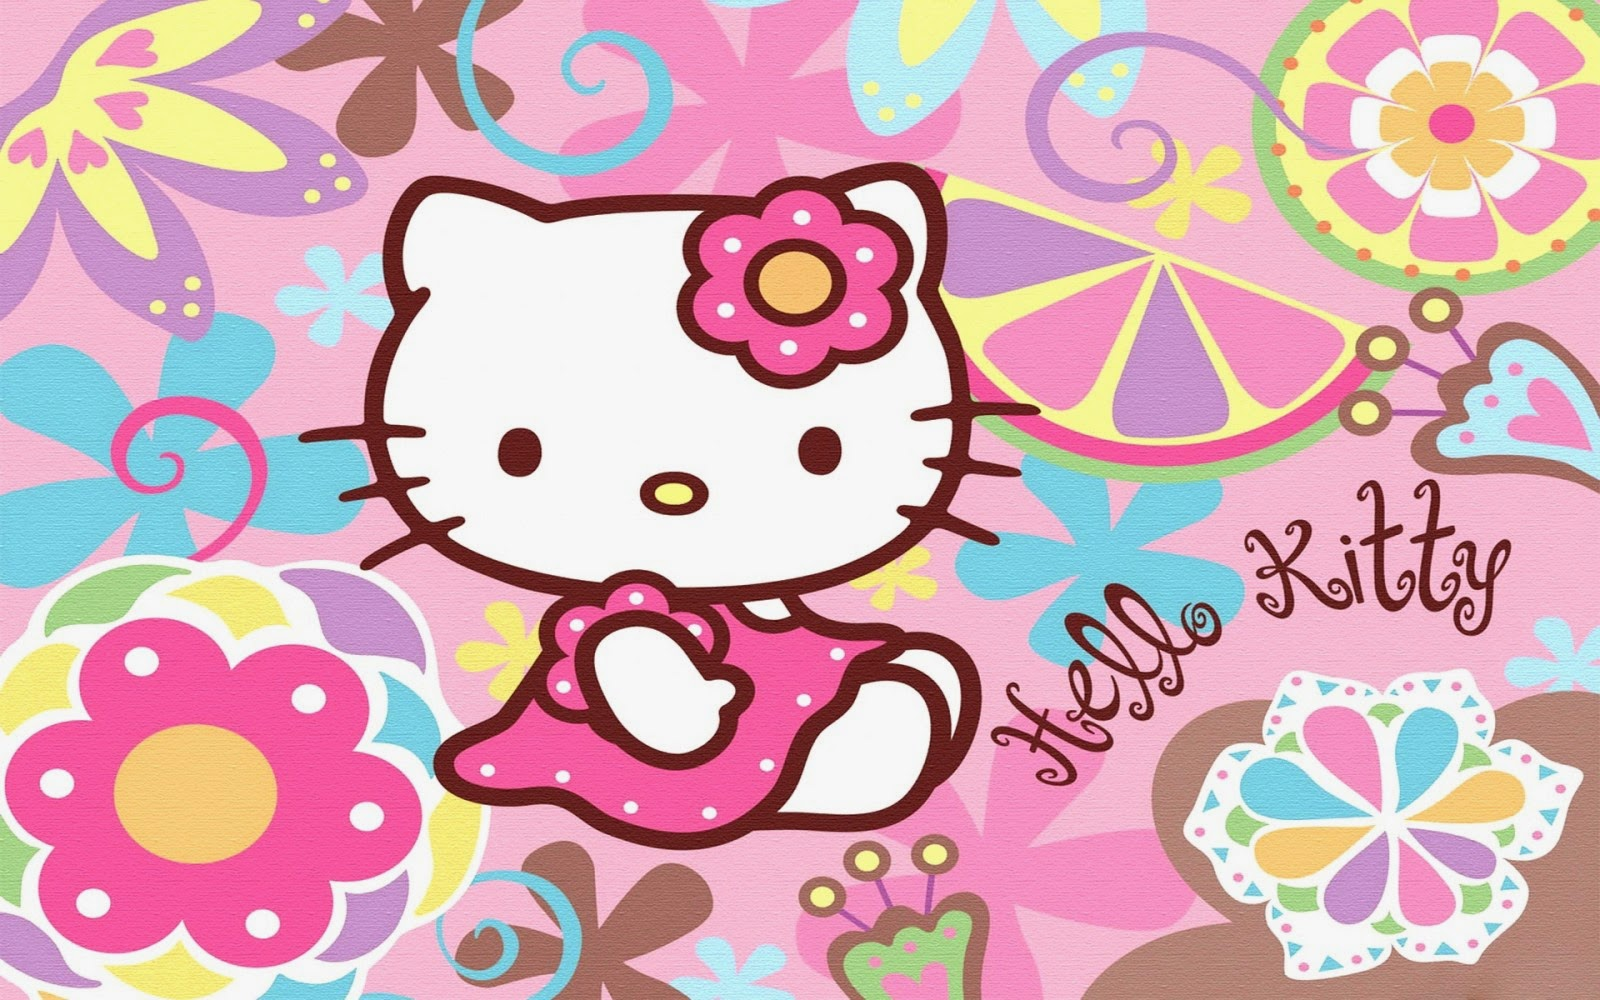 Gambar Wallpaper Hello Kitty HD Lucu 1280 x 800